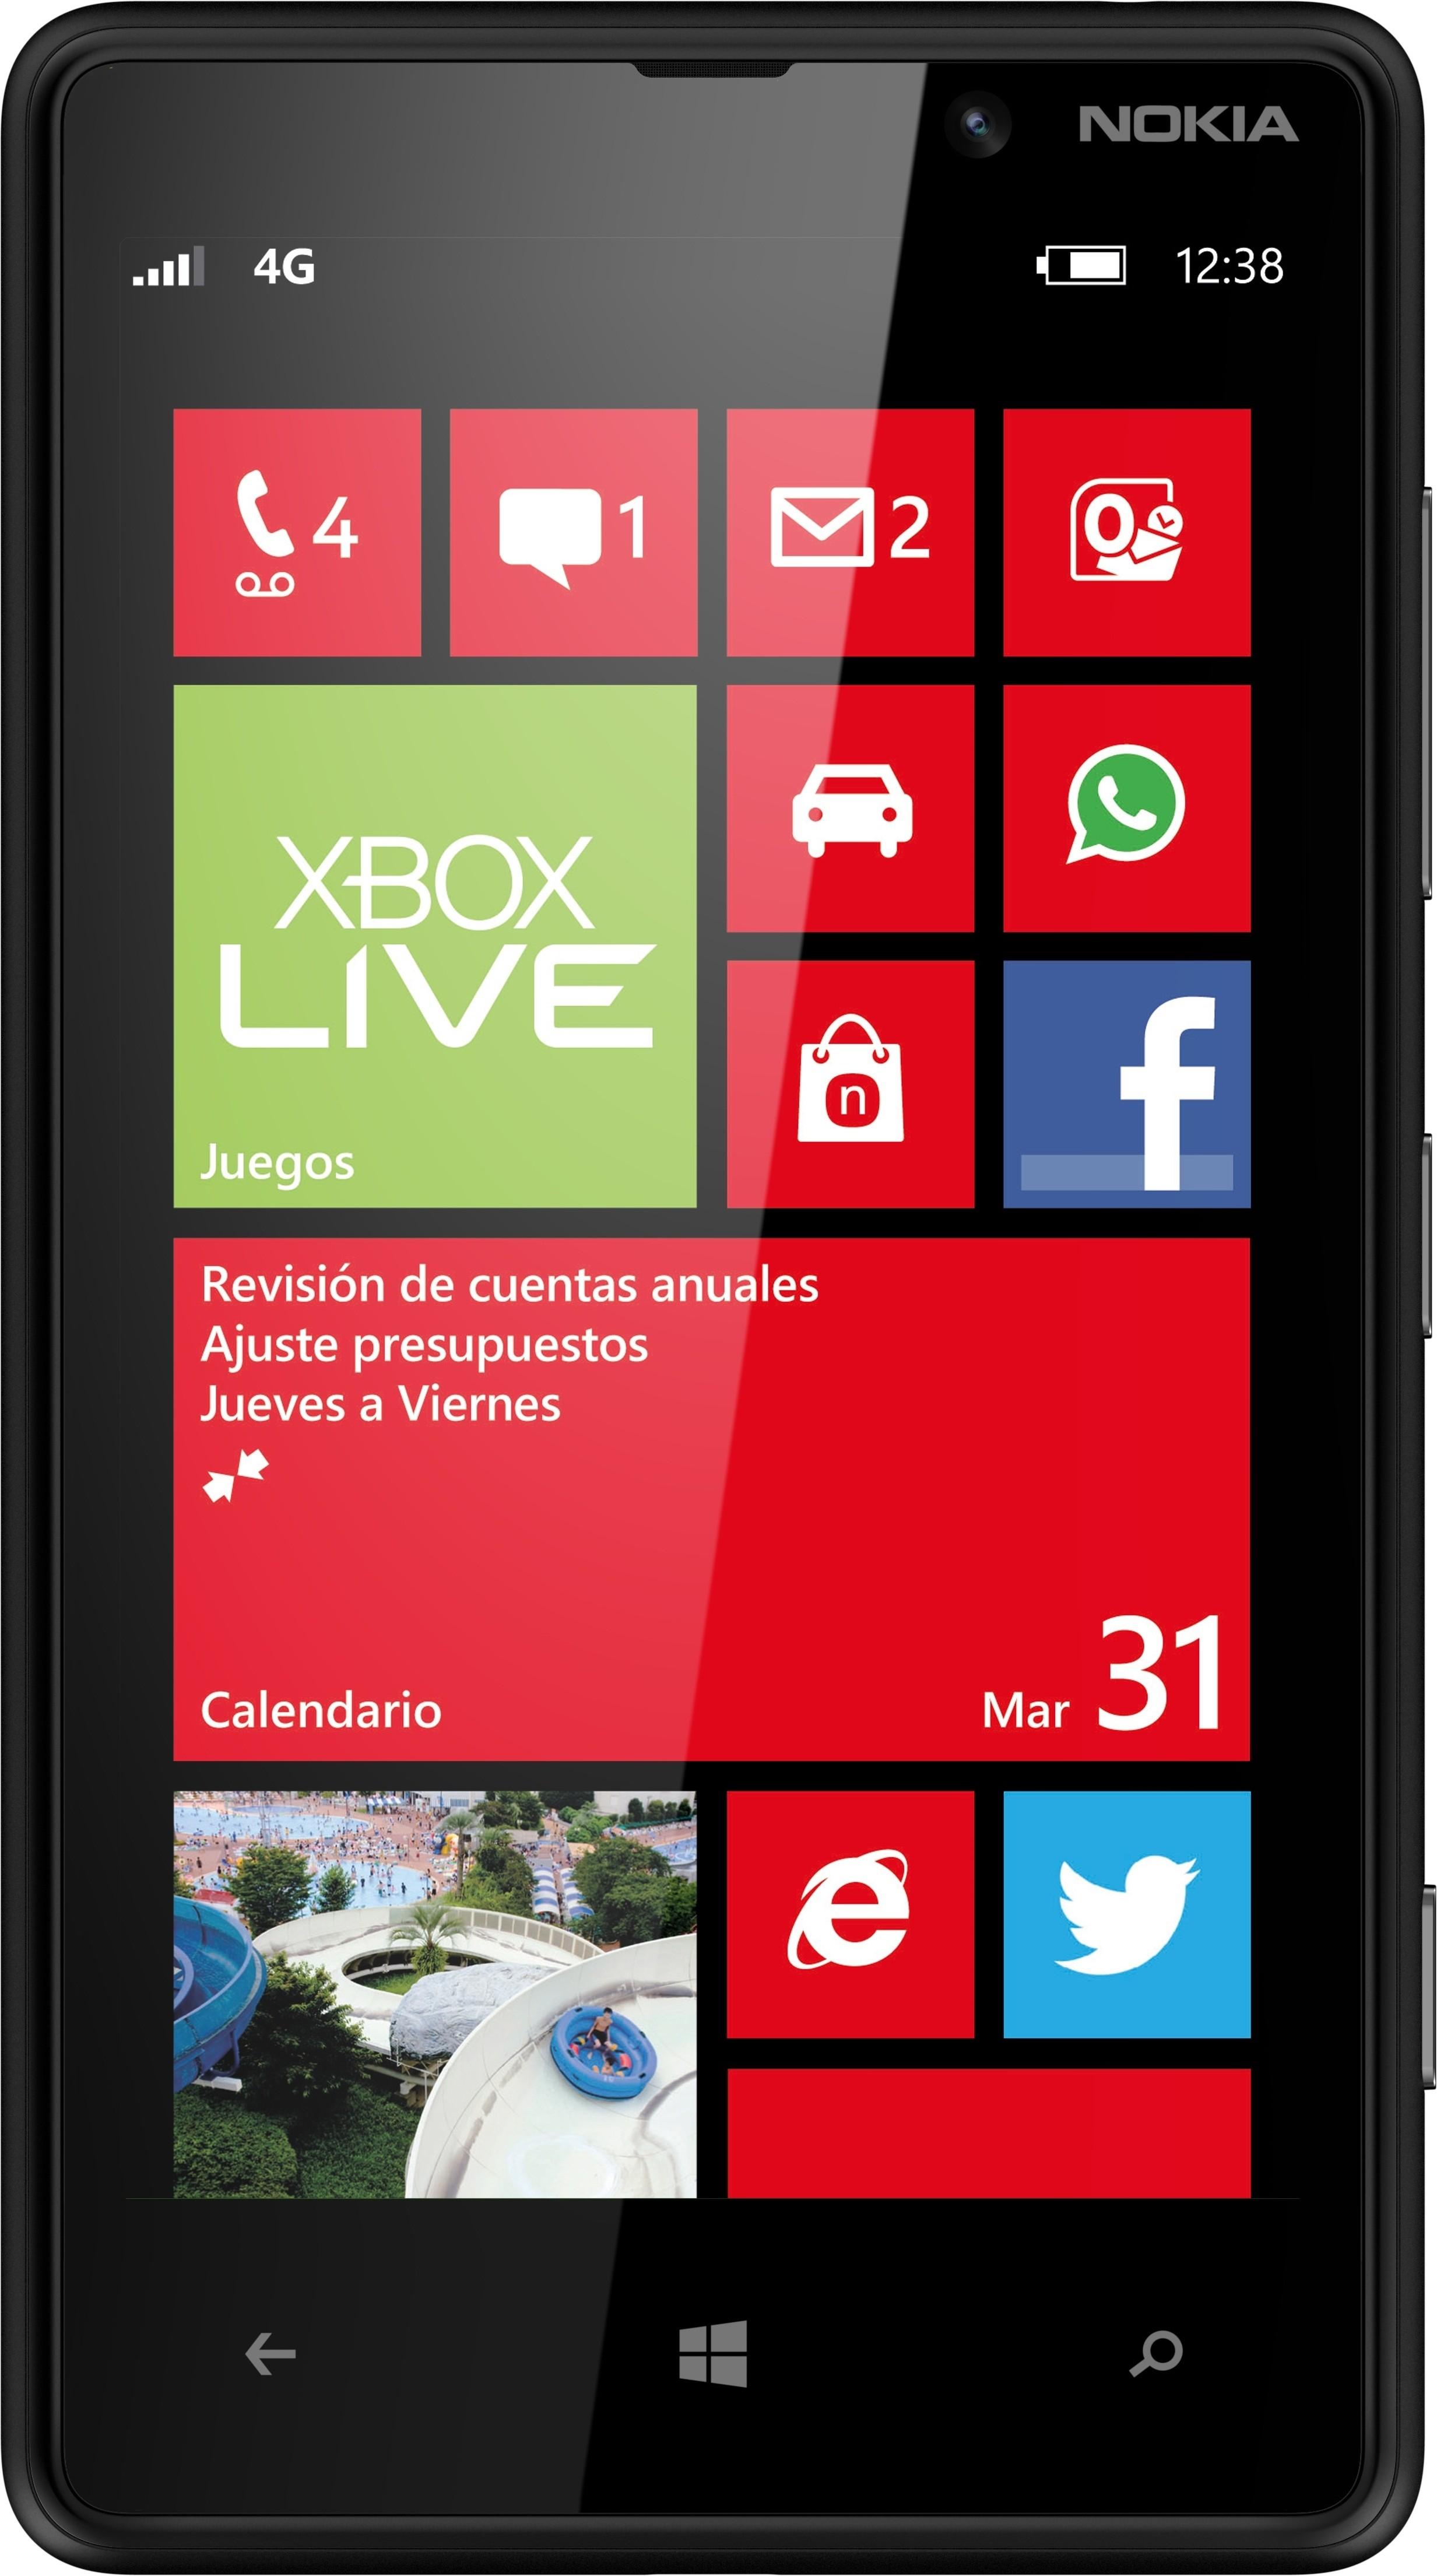 Nokia Lumia 820 (1GB RAM, 8GB)